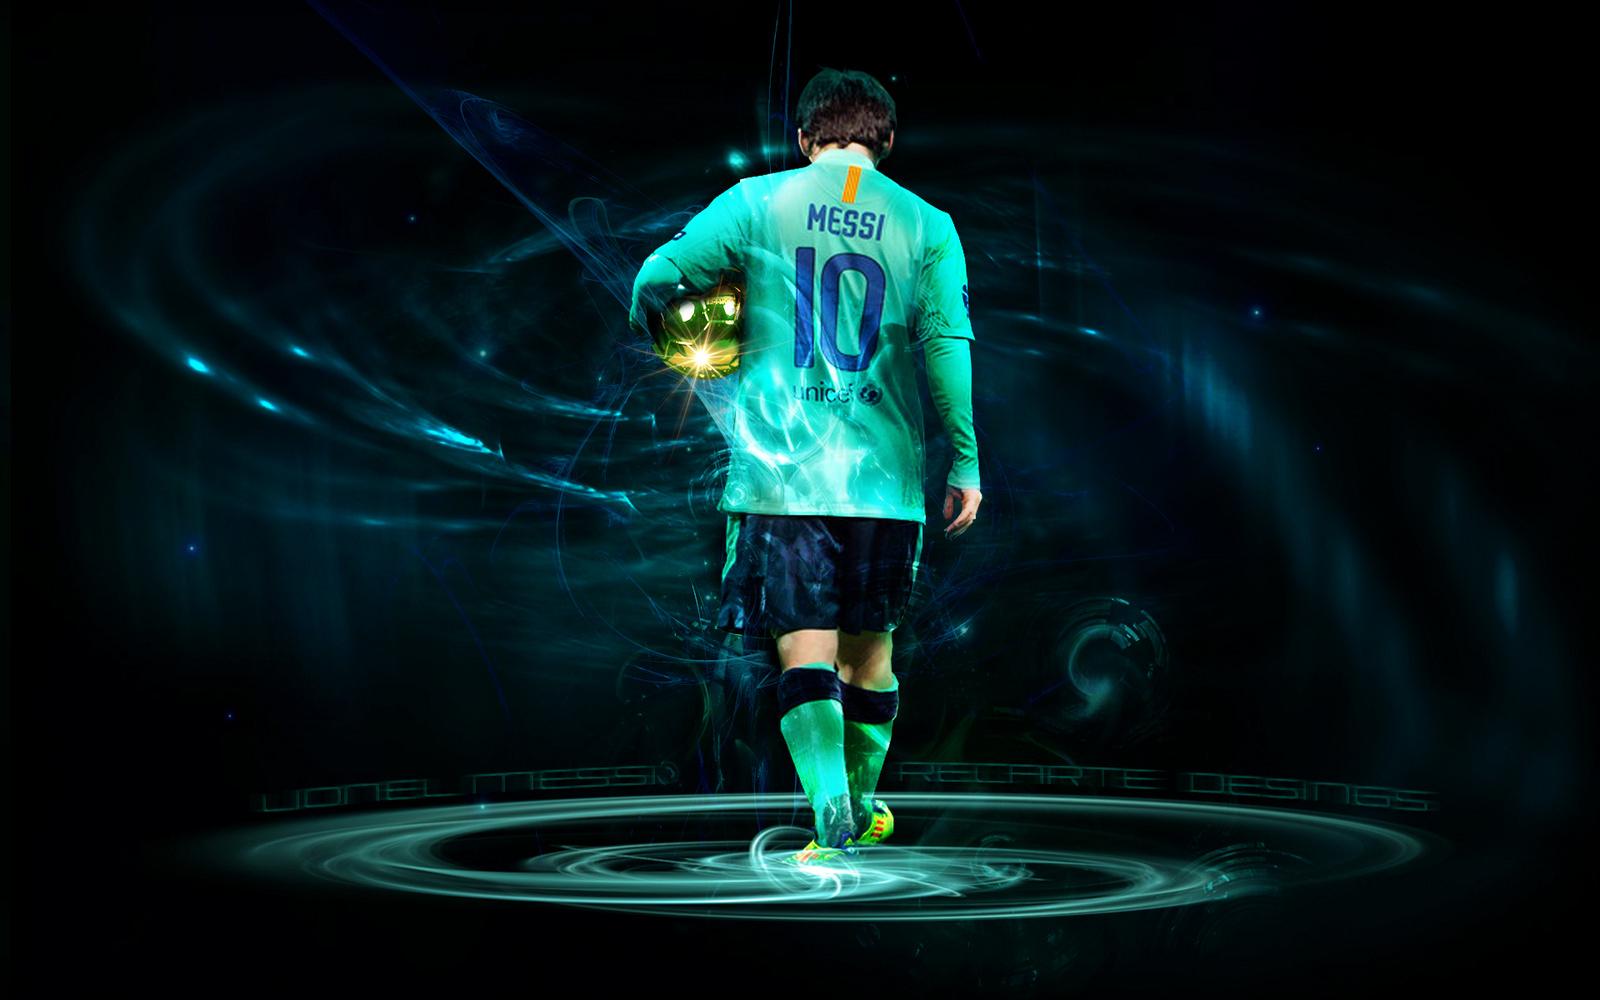 Messi Argentina Team Wallpaper HD Wallpaper WallpaperLepi 1600x1000